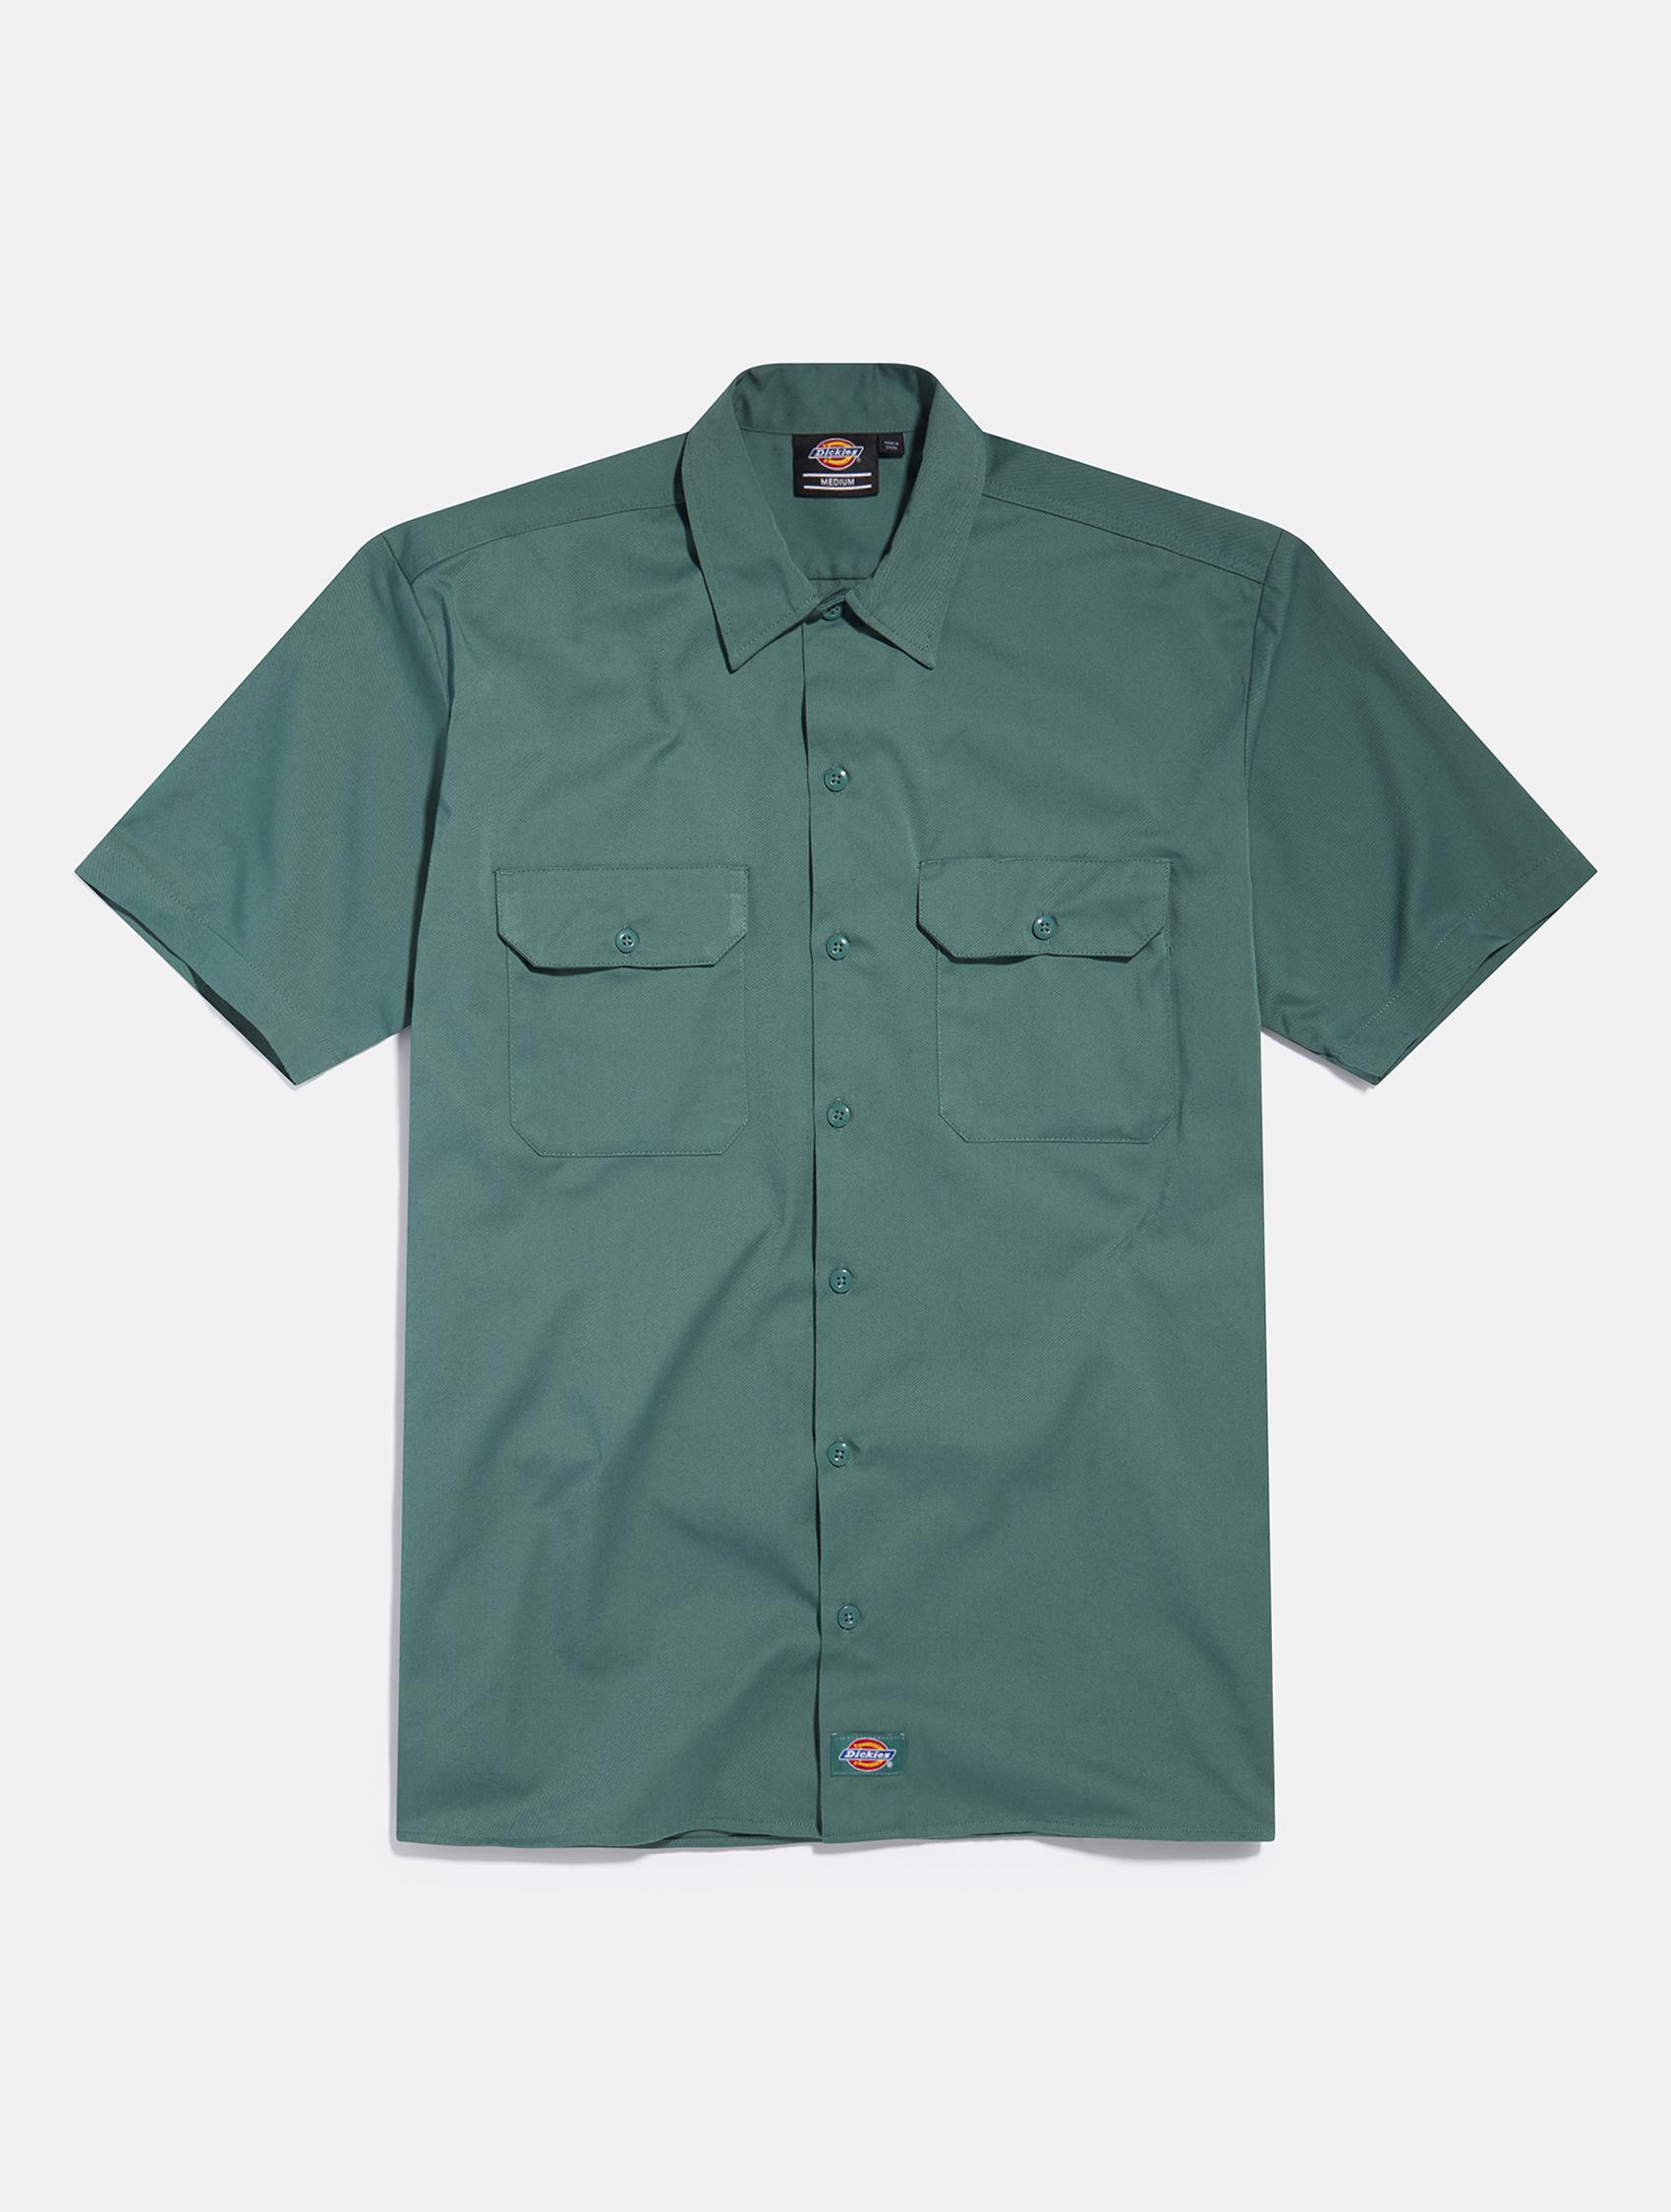 Green Dickies short sleeve shirt   eCommerce Photography London